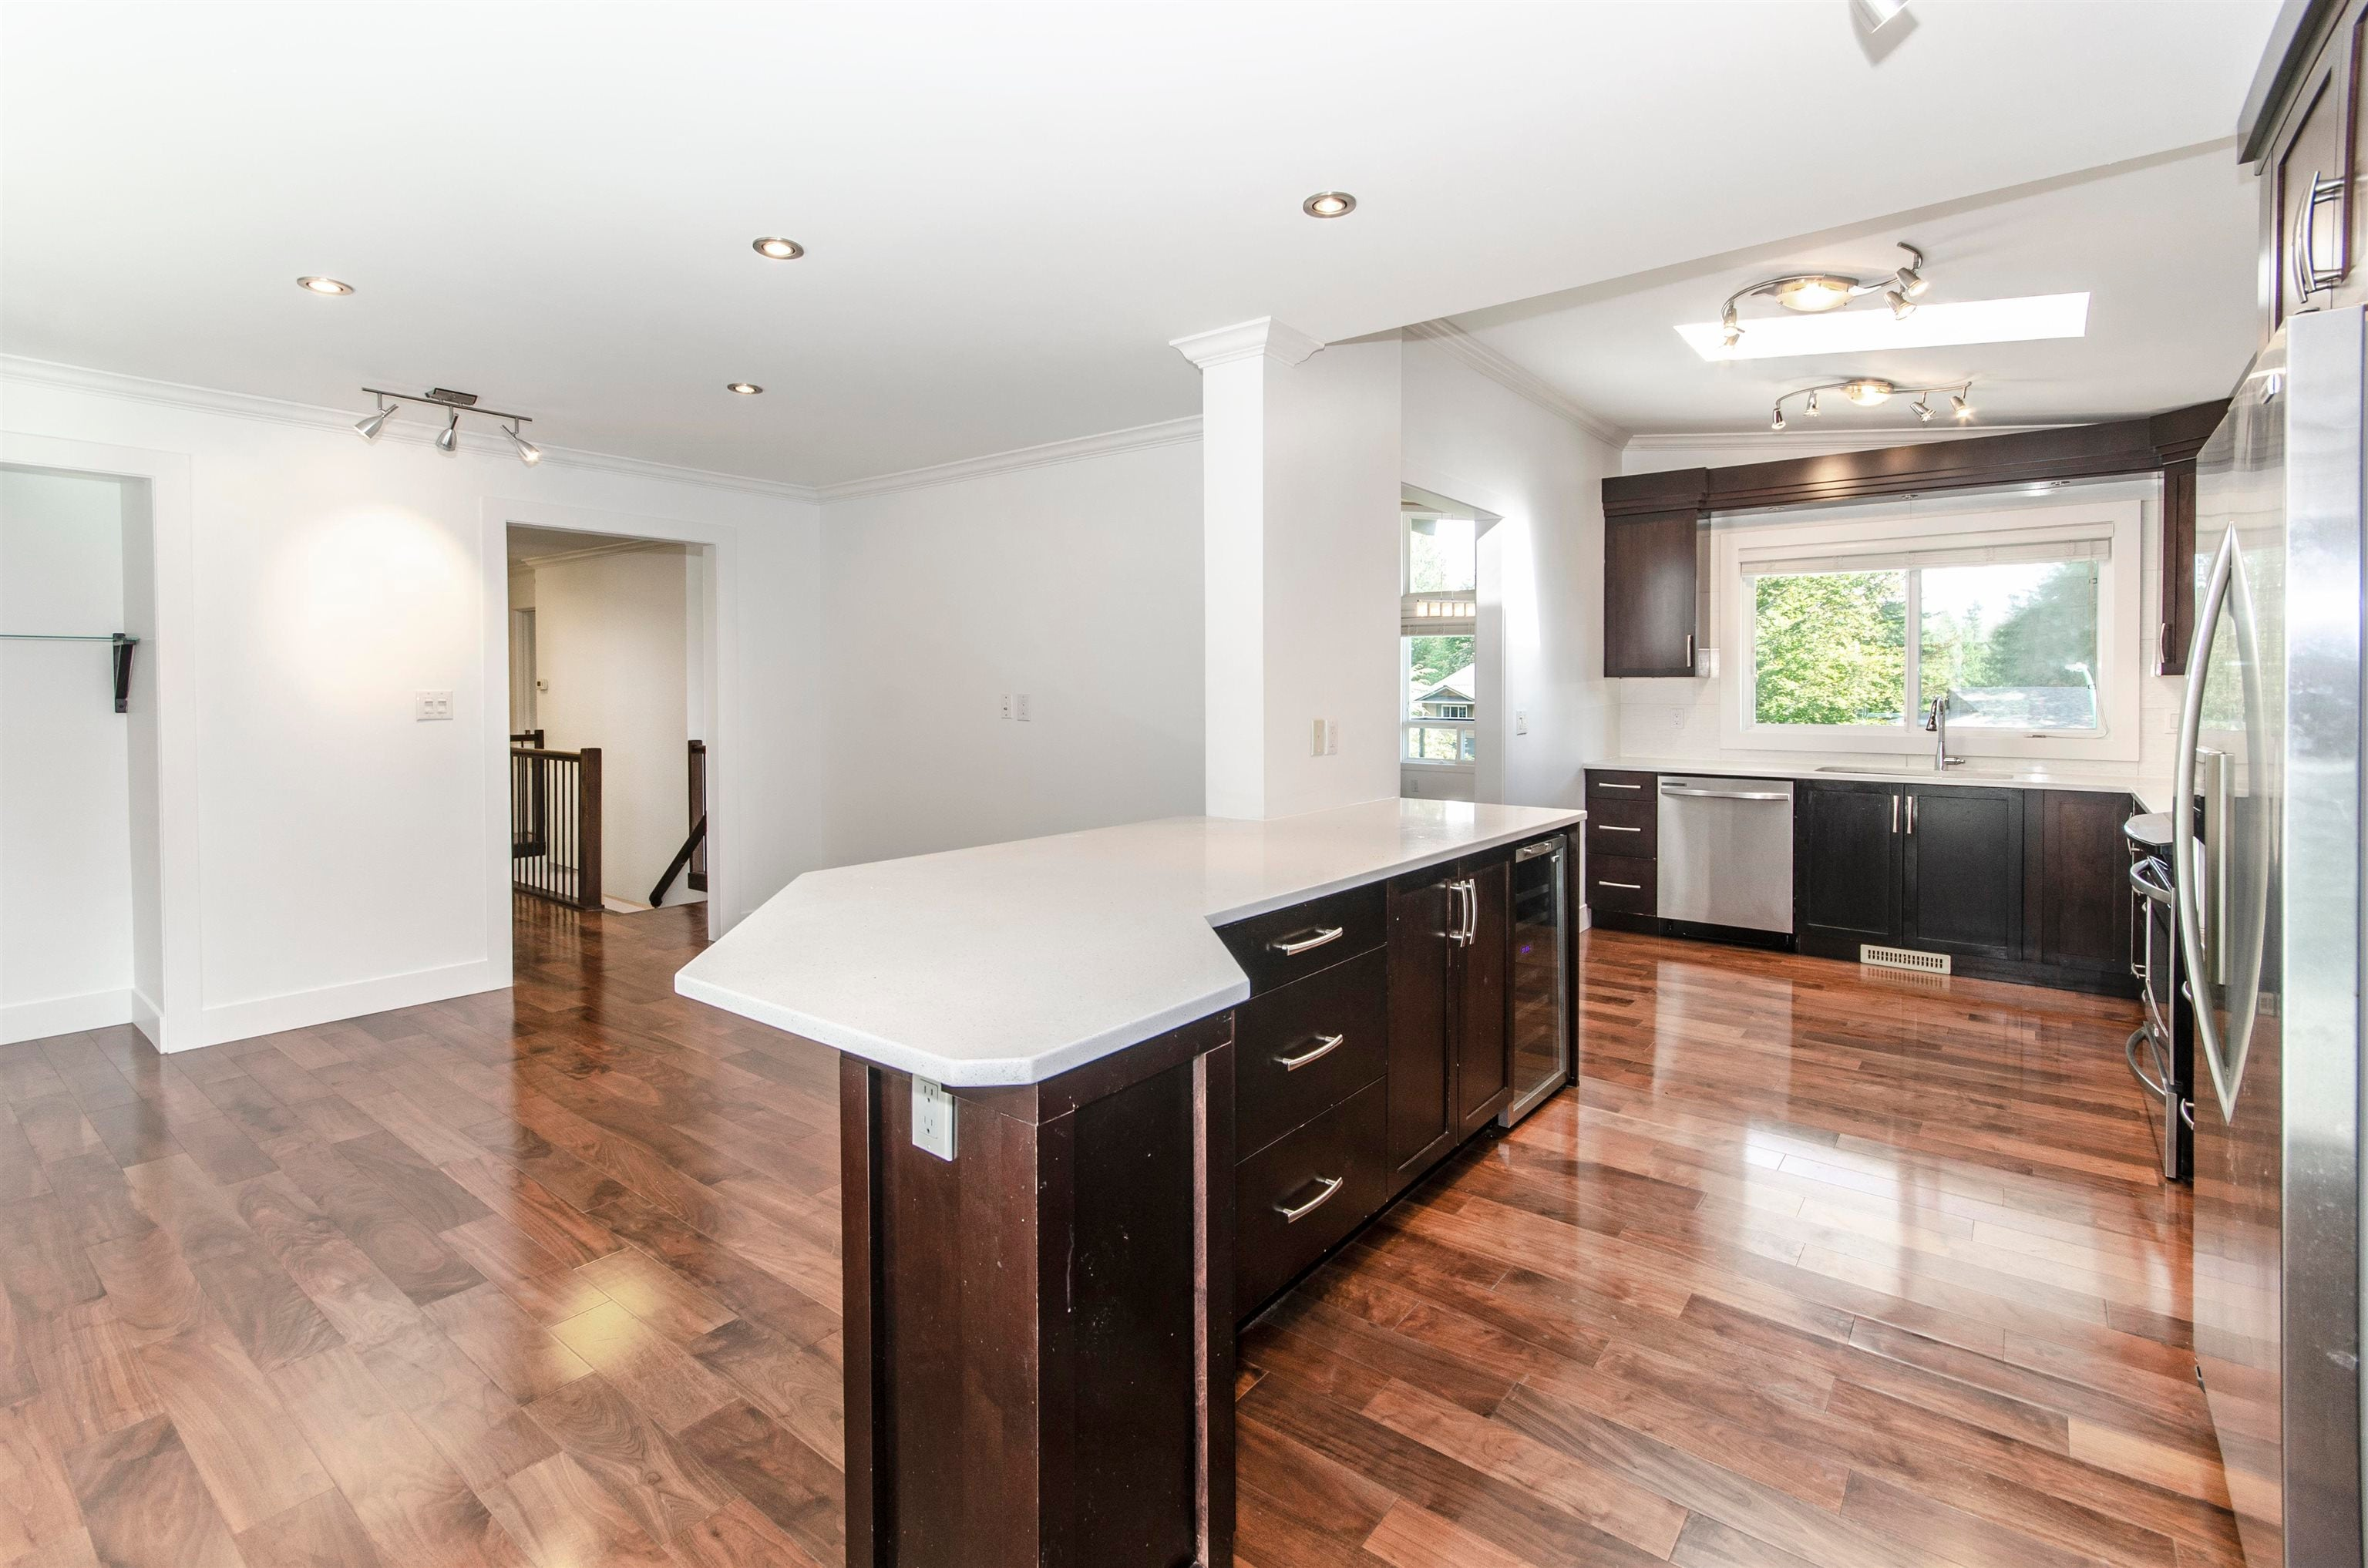 3785 REGENT AVENUE - Upper Lonsdale House/Single Family for sale, 4 Bedrooms (R2617648) - #9